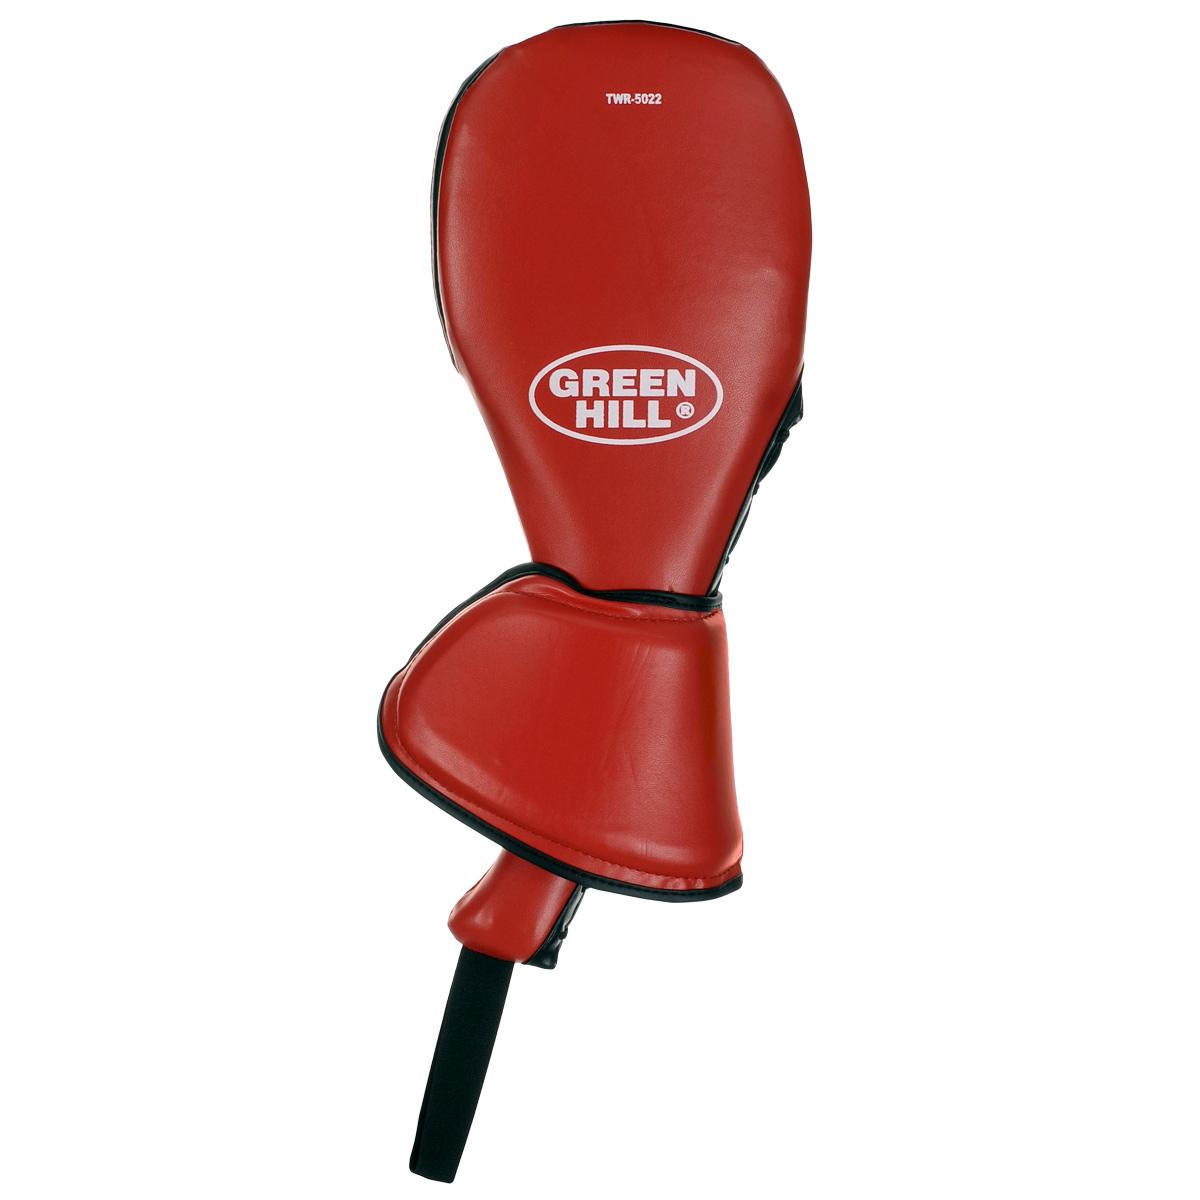 Green Hill Ракетка для тхэквондо Green Hill, двойная, цвет: красный. TWR-5022